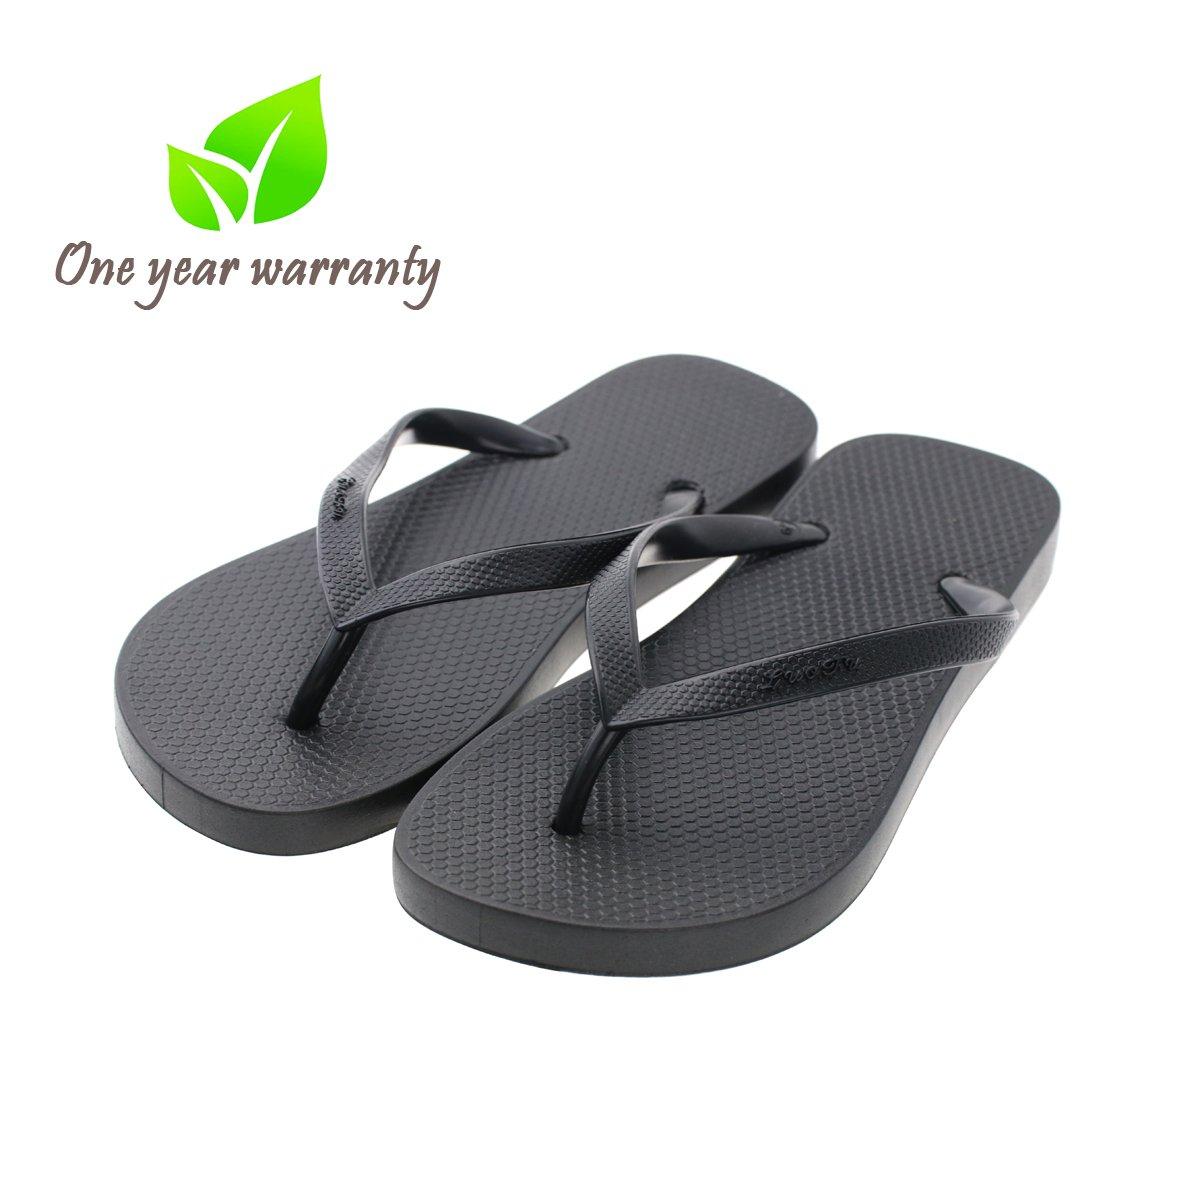 Memorygou Flip-Flops Beach Slim Sandal Women/Men, Black Design Comfort Proof Slippers Black (US 12, Black)